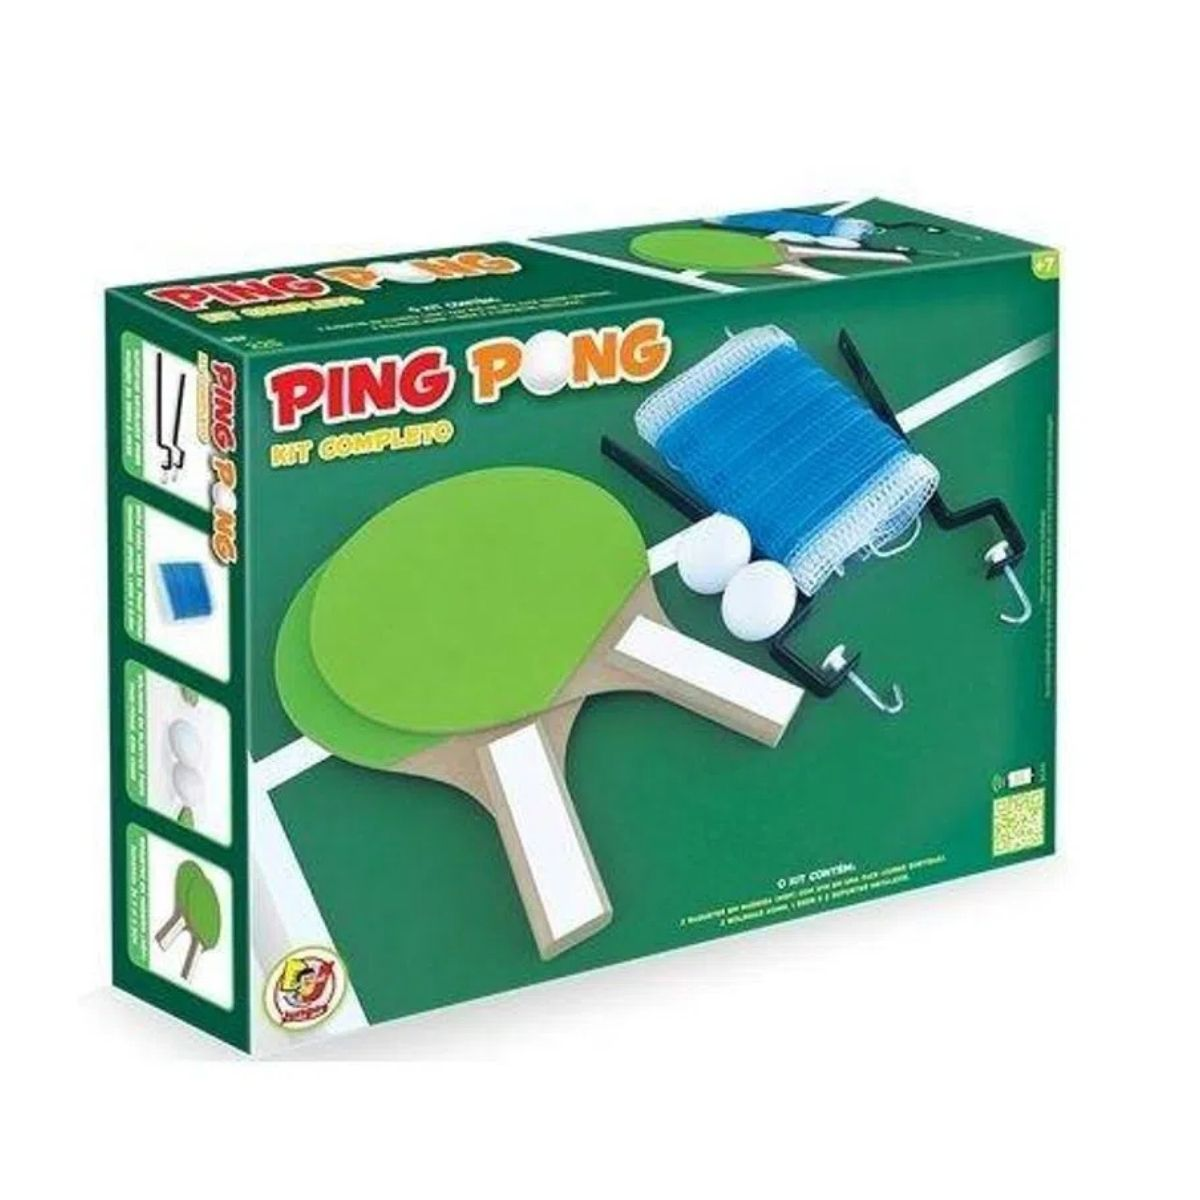 Kit 2 Raquete Tenis De Mesa Ping Pong